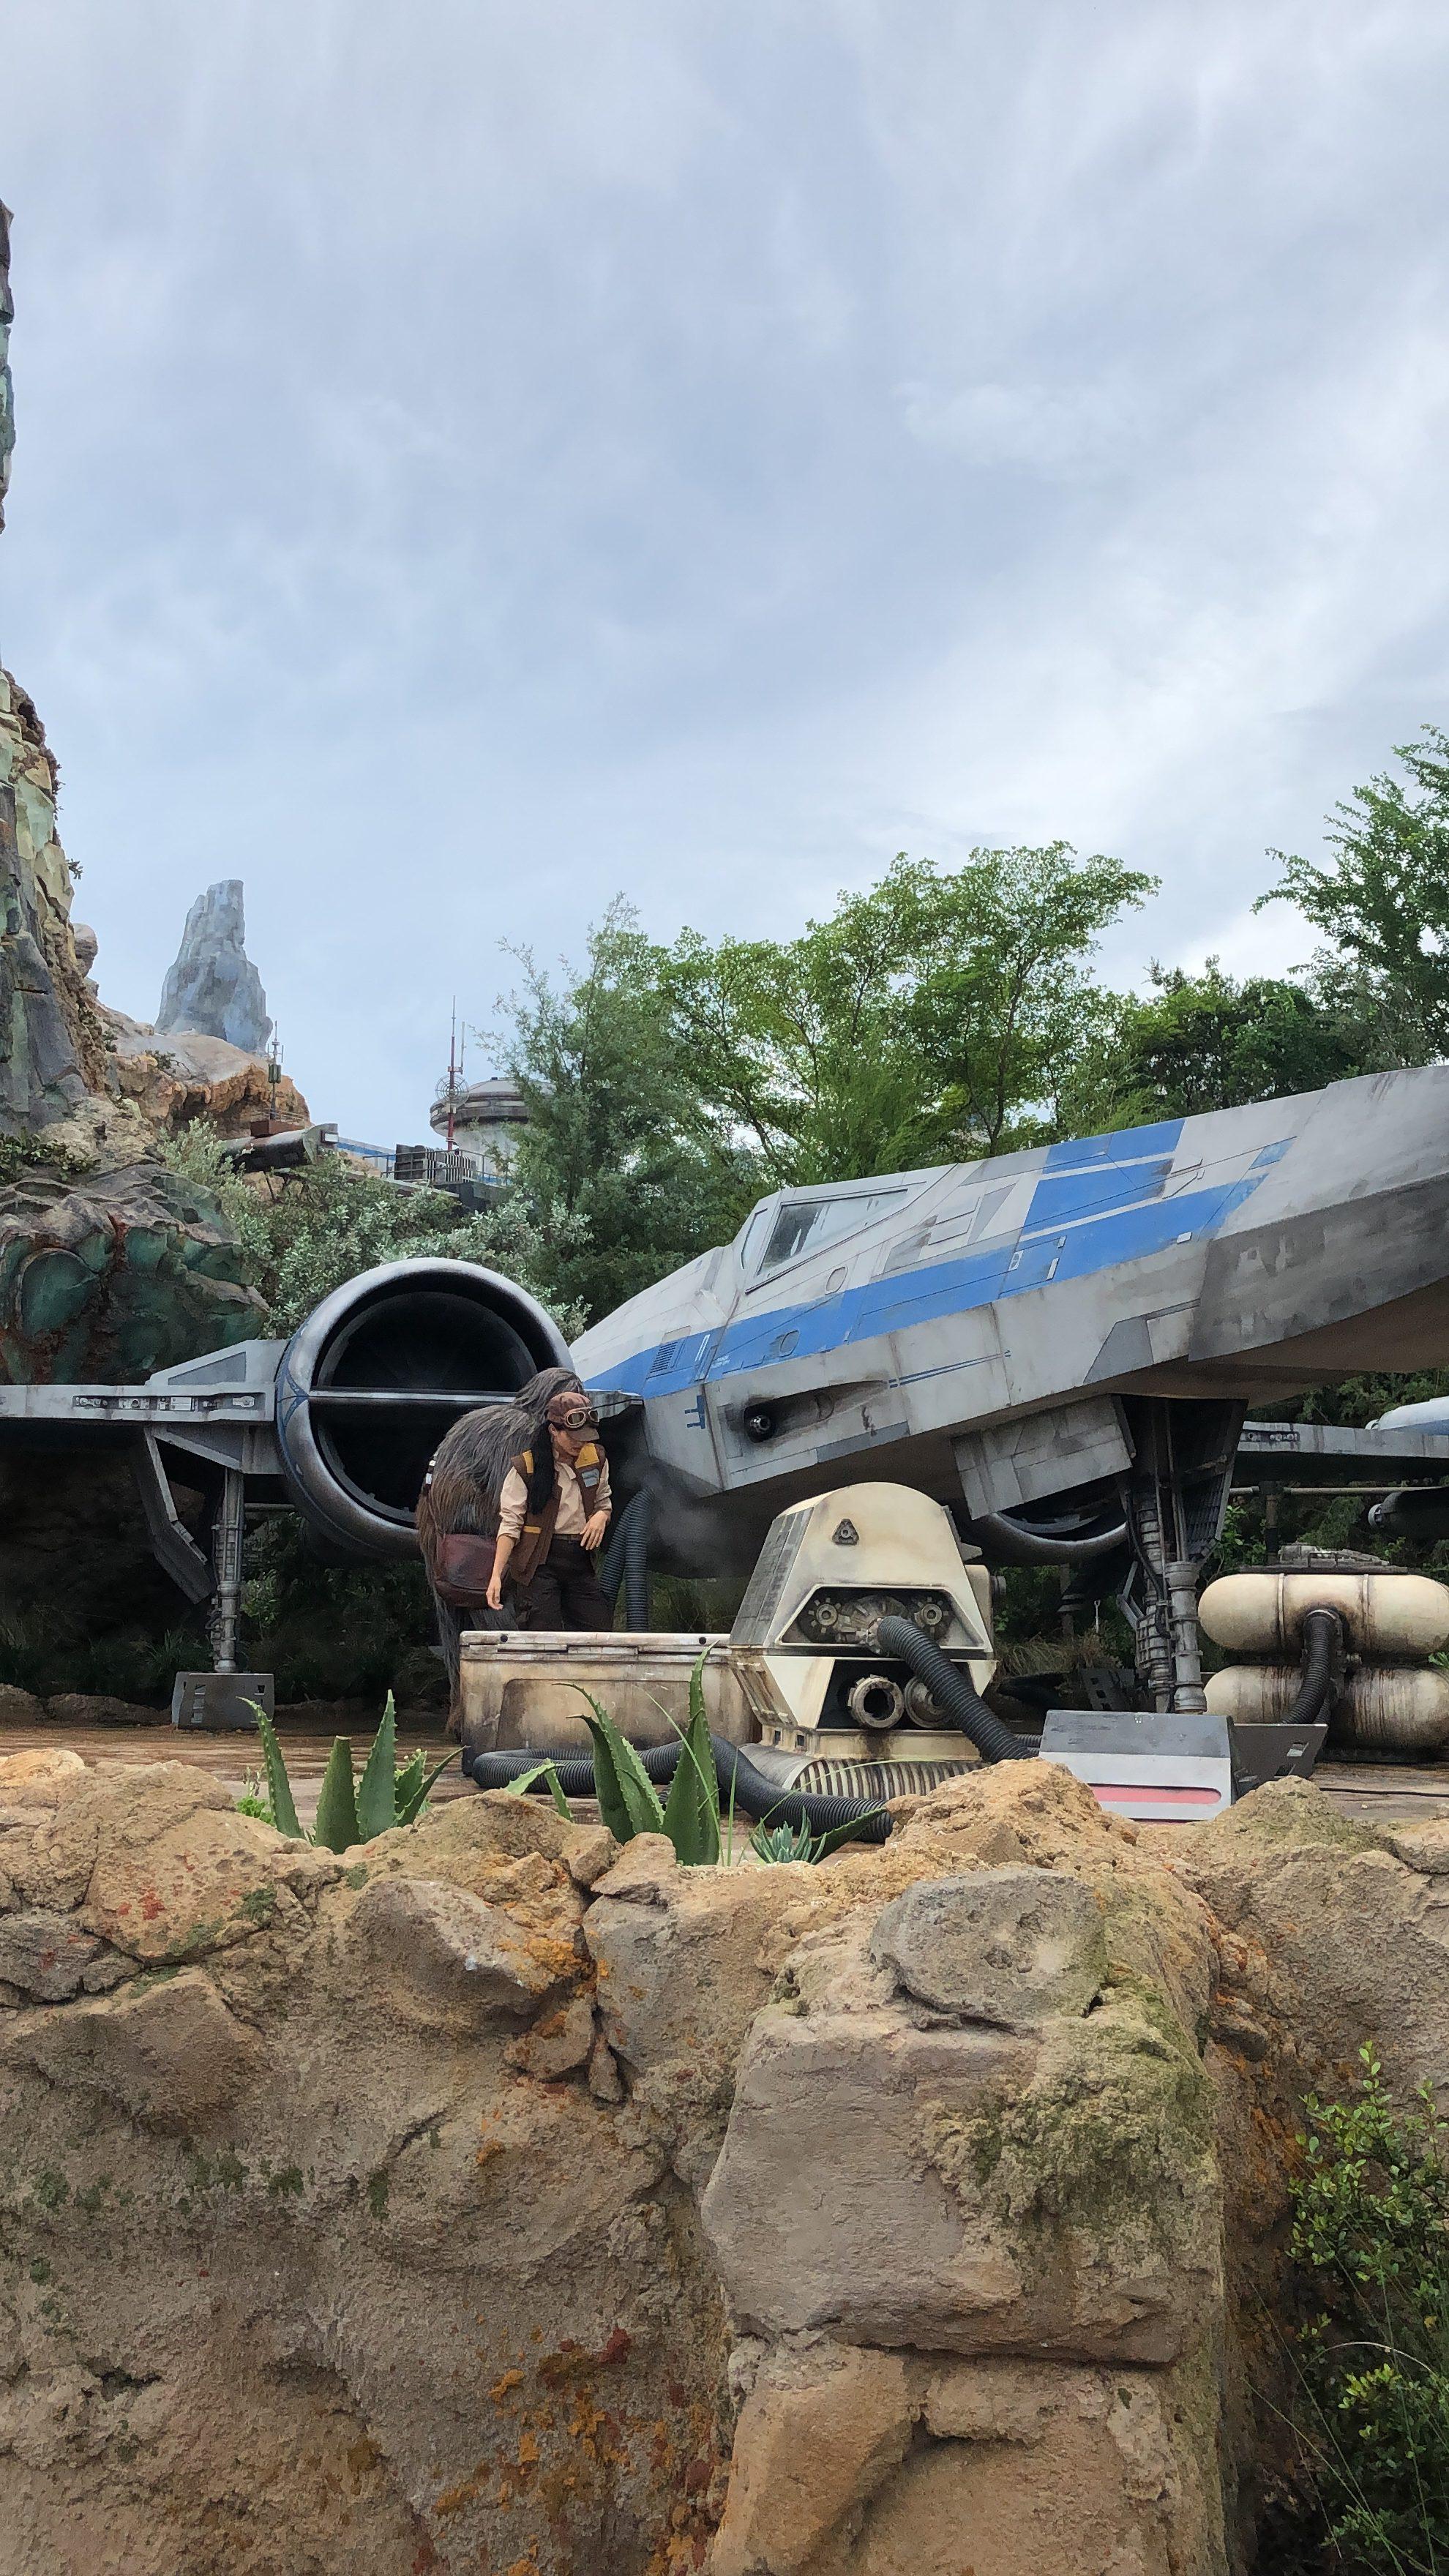 StarWars Galaxy's Edge on Battuu at Disney's Hollywood Studios